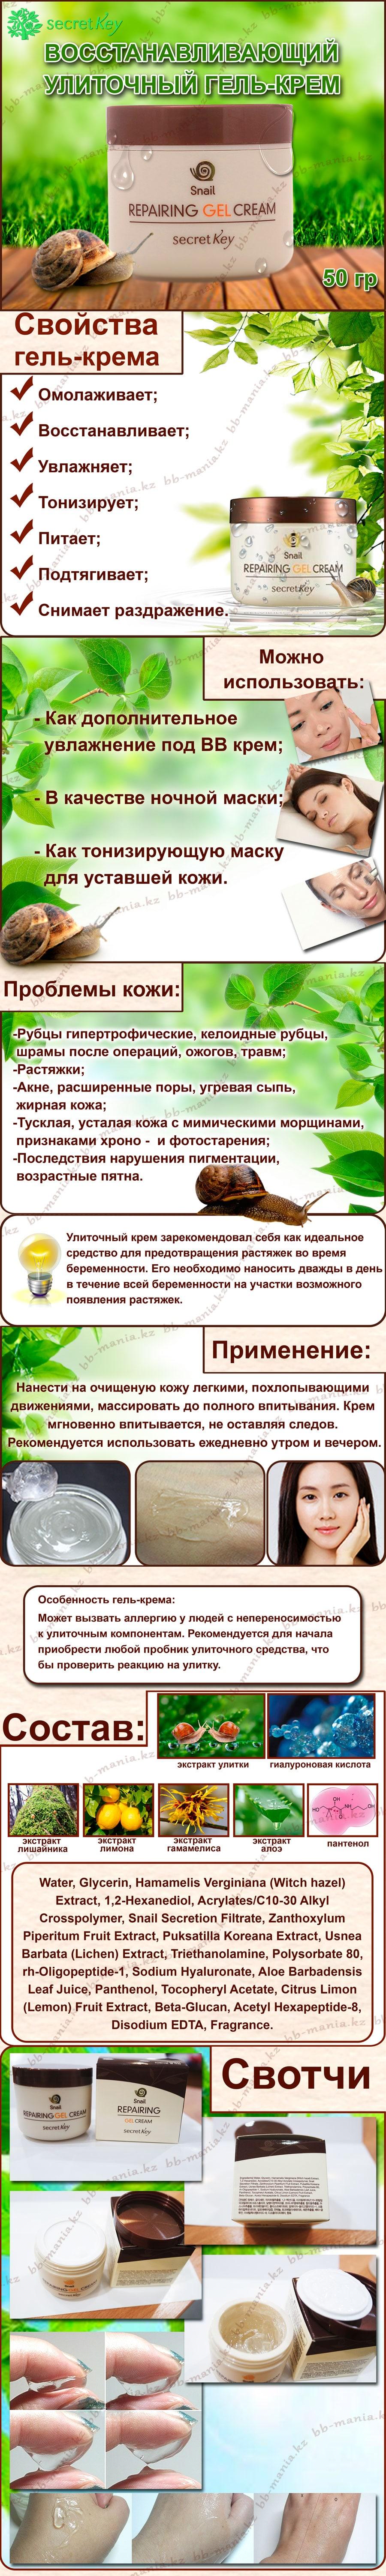 snail-repairing-gel-cream-secret-key-min